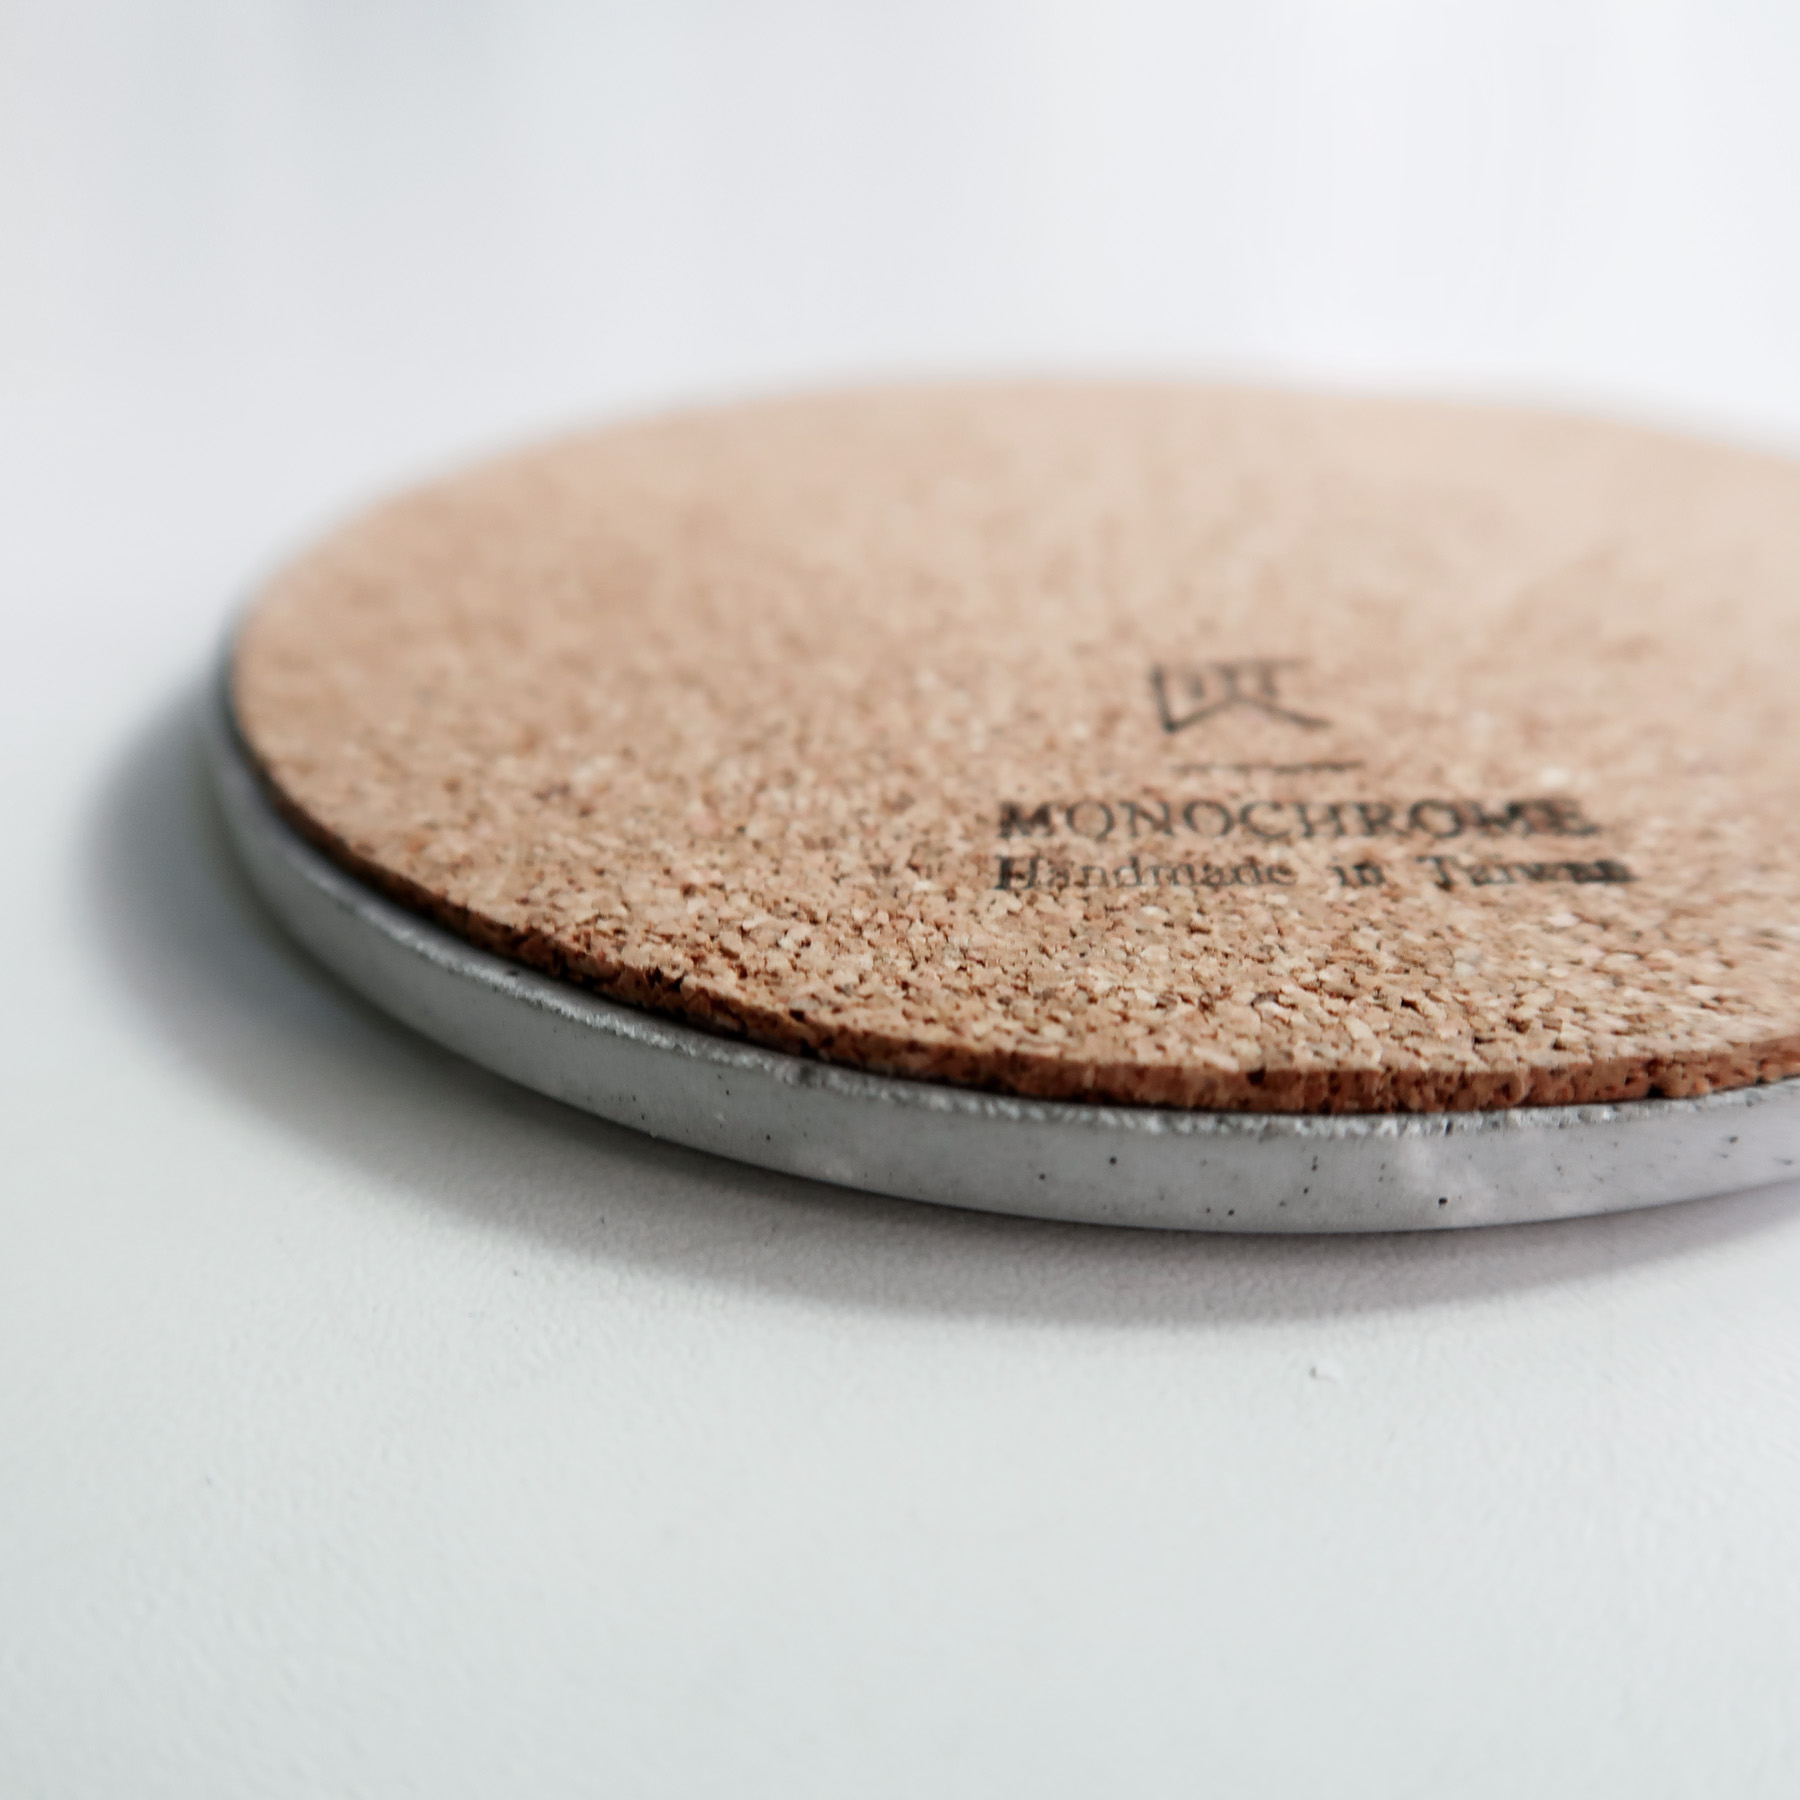 Concrete Design 月蝕金邊倒角設計水泥吸水圓墊・杯墊・飾品盤 - 軟木底墊